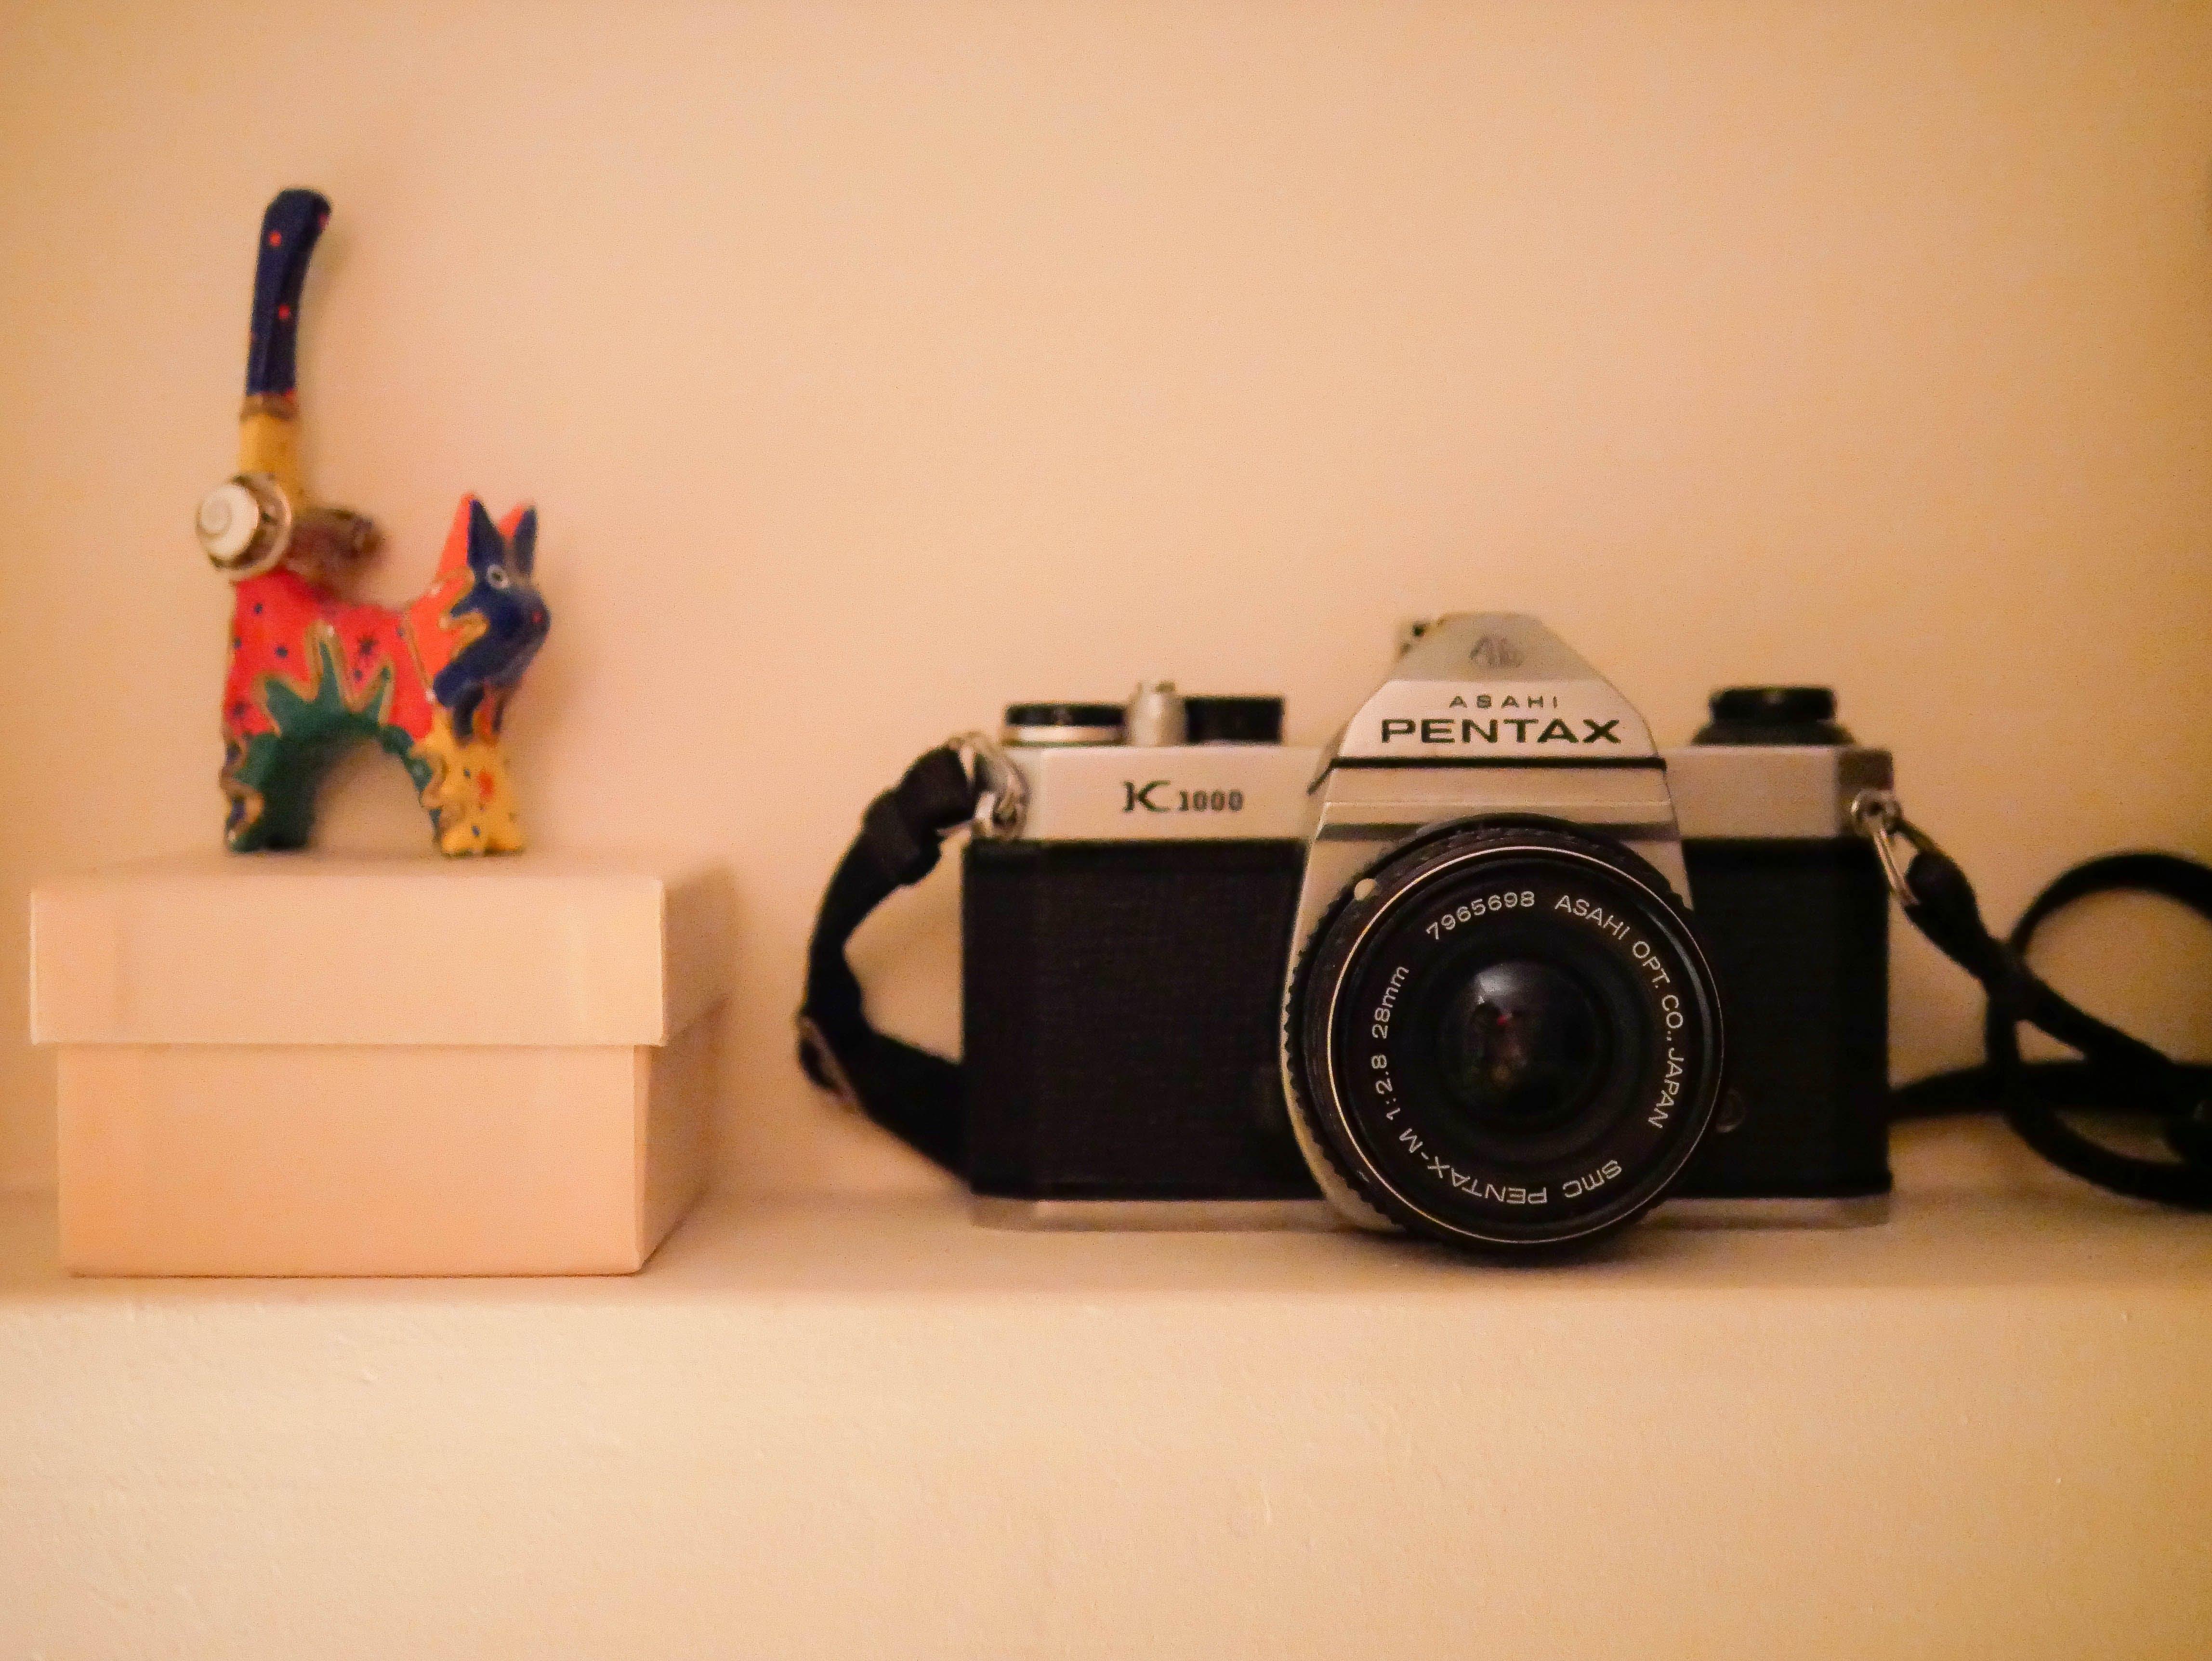 Free stock photo of camera, leica, lens, Pentax